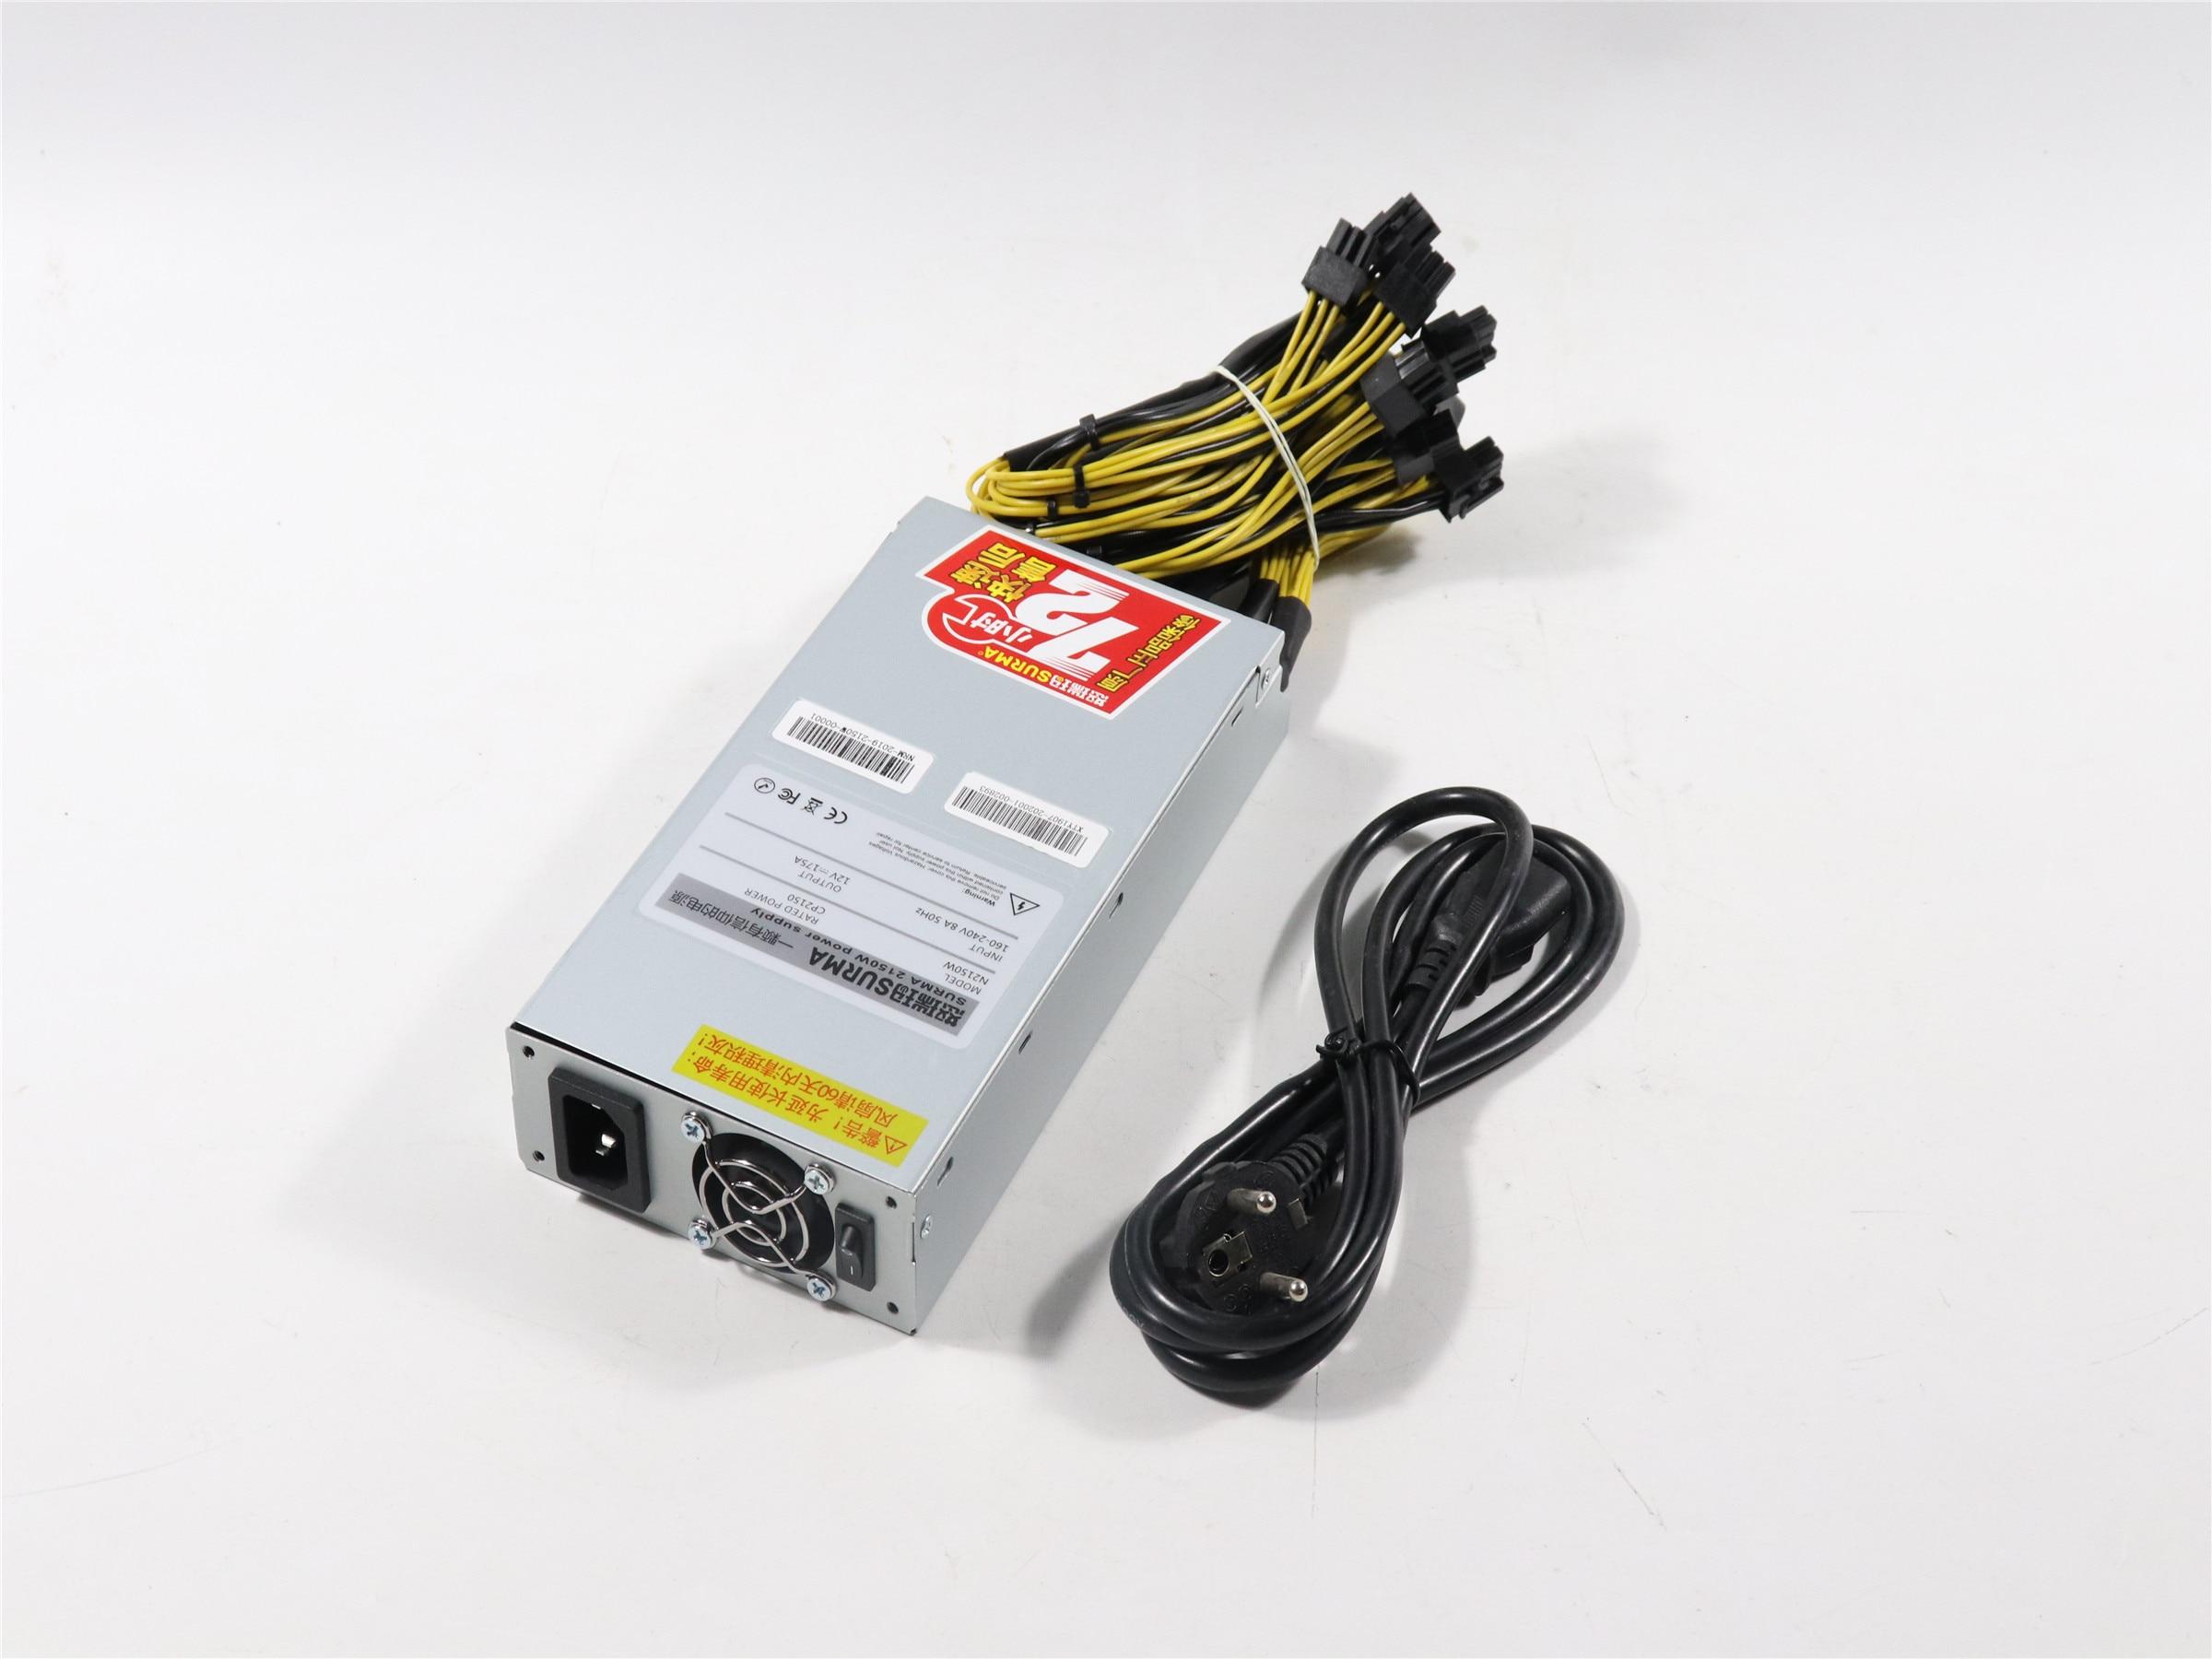 Power-Supply BTC Dash-Miner S9 ETH Ebit E9i LTC Innosilicon Z9 L3 Z11 New ZEC PSU